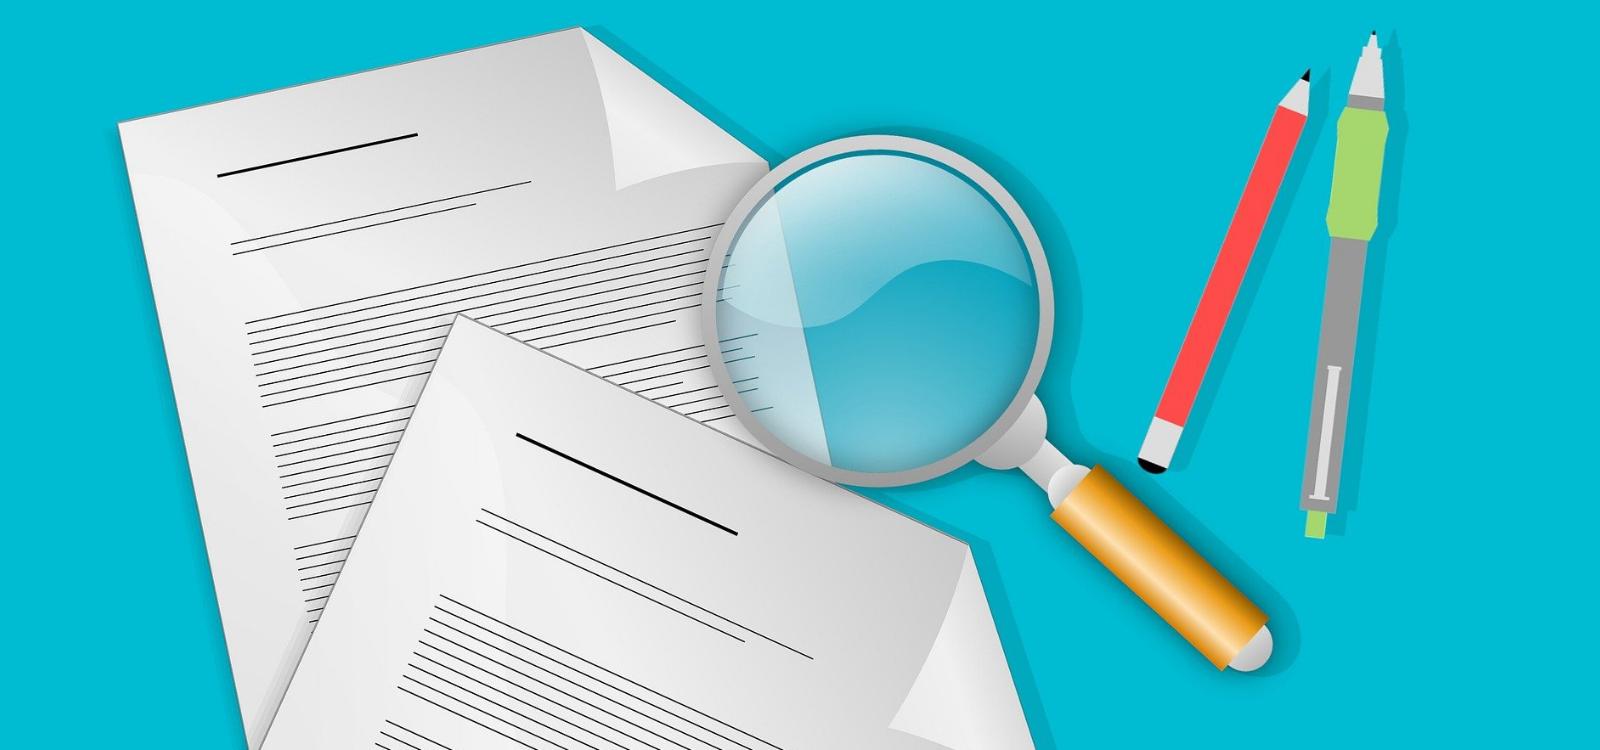 EBP Audit requirements image Warren Averett